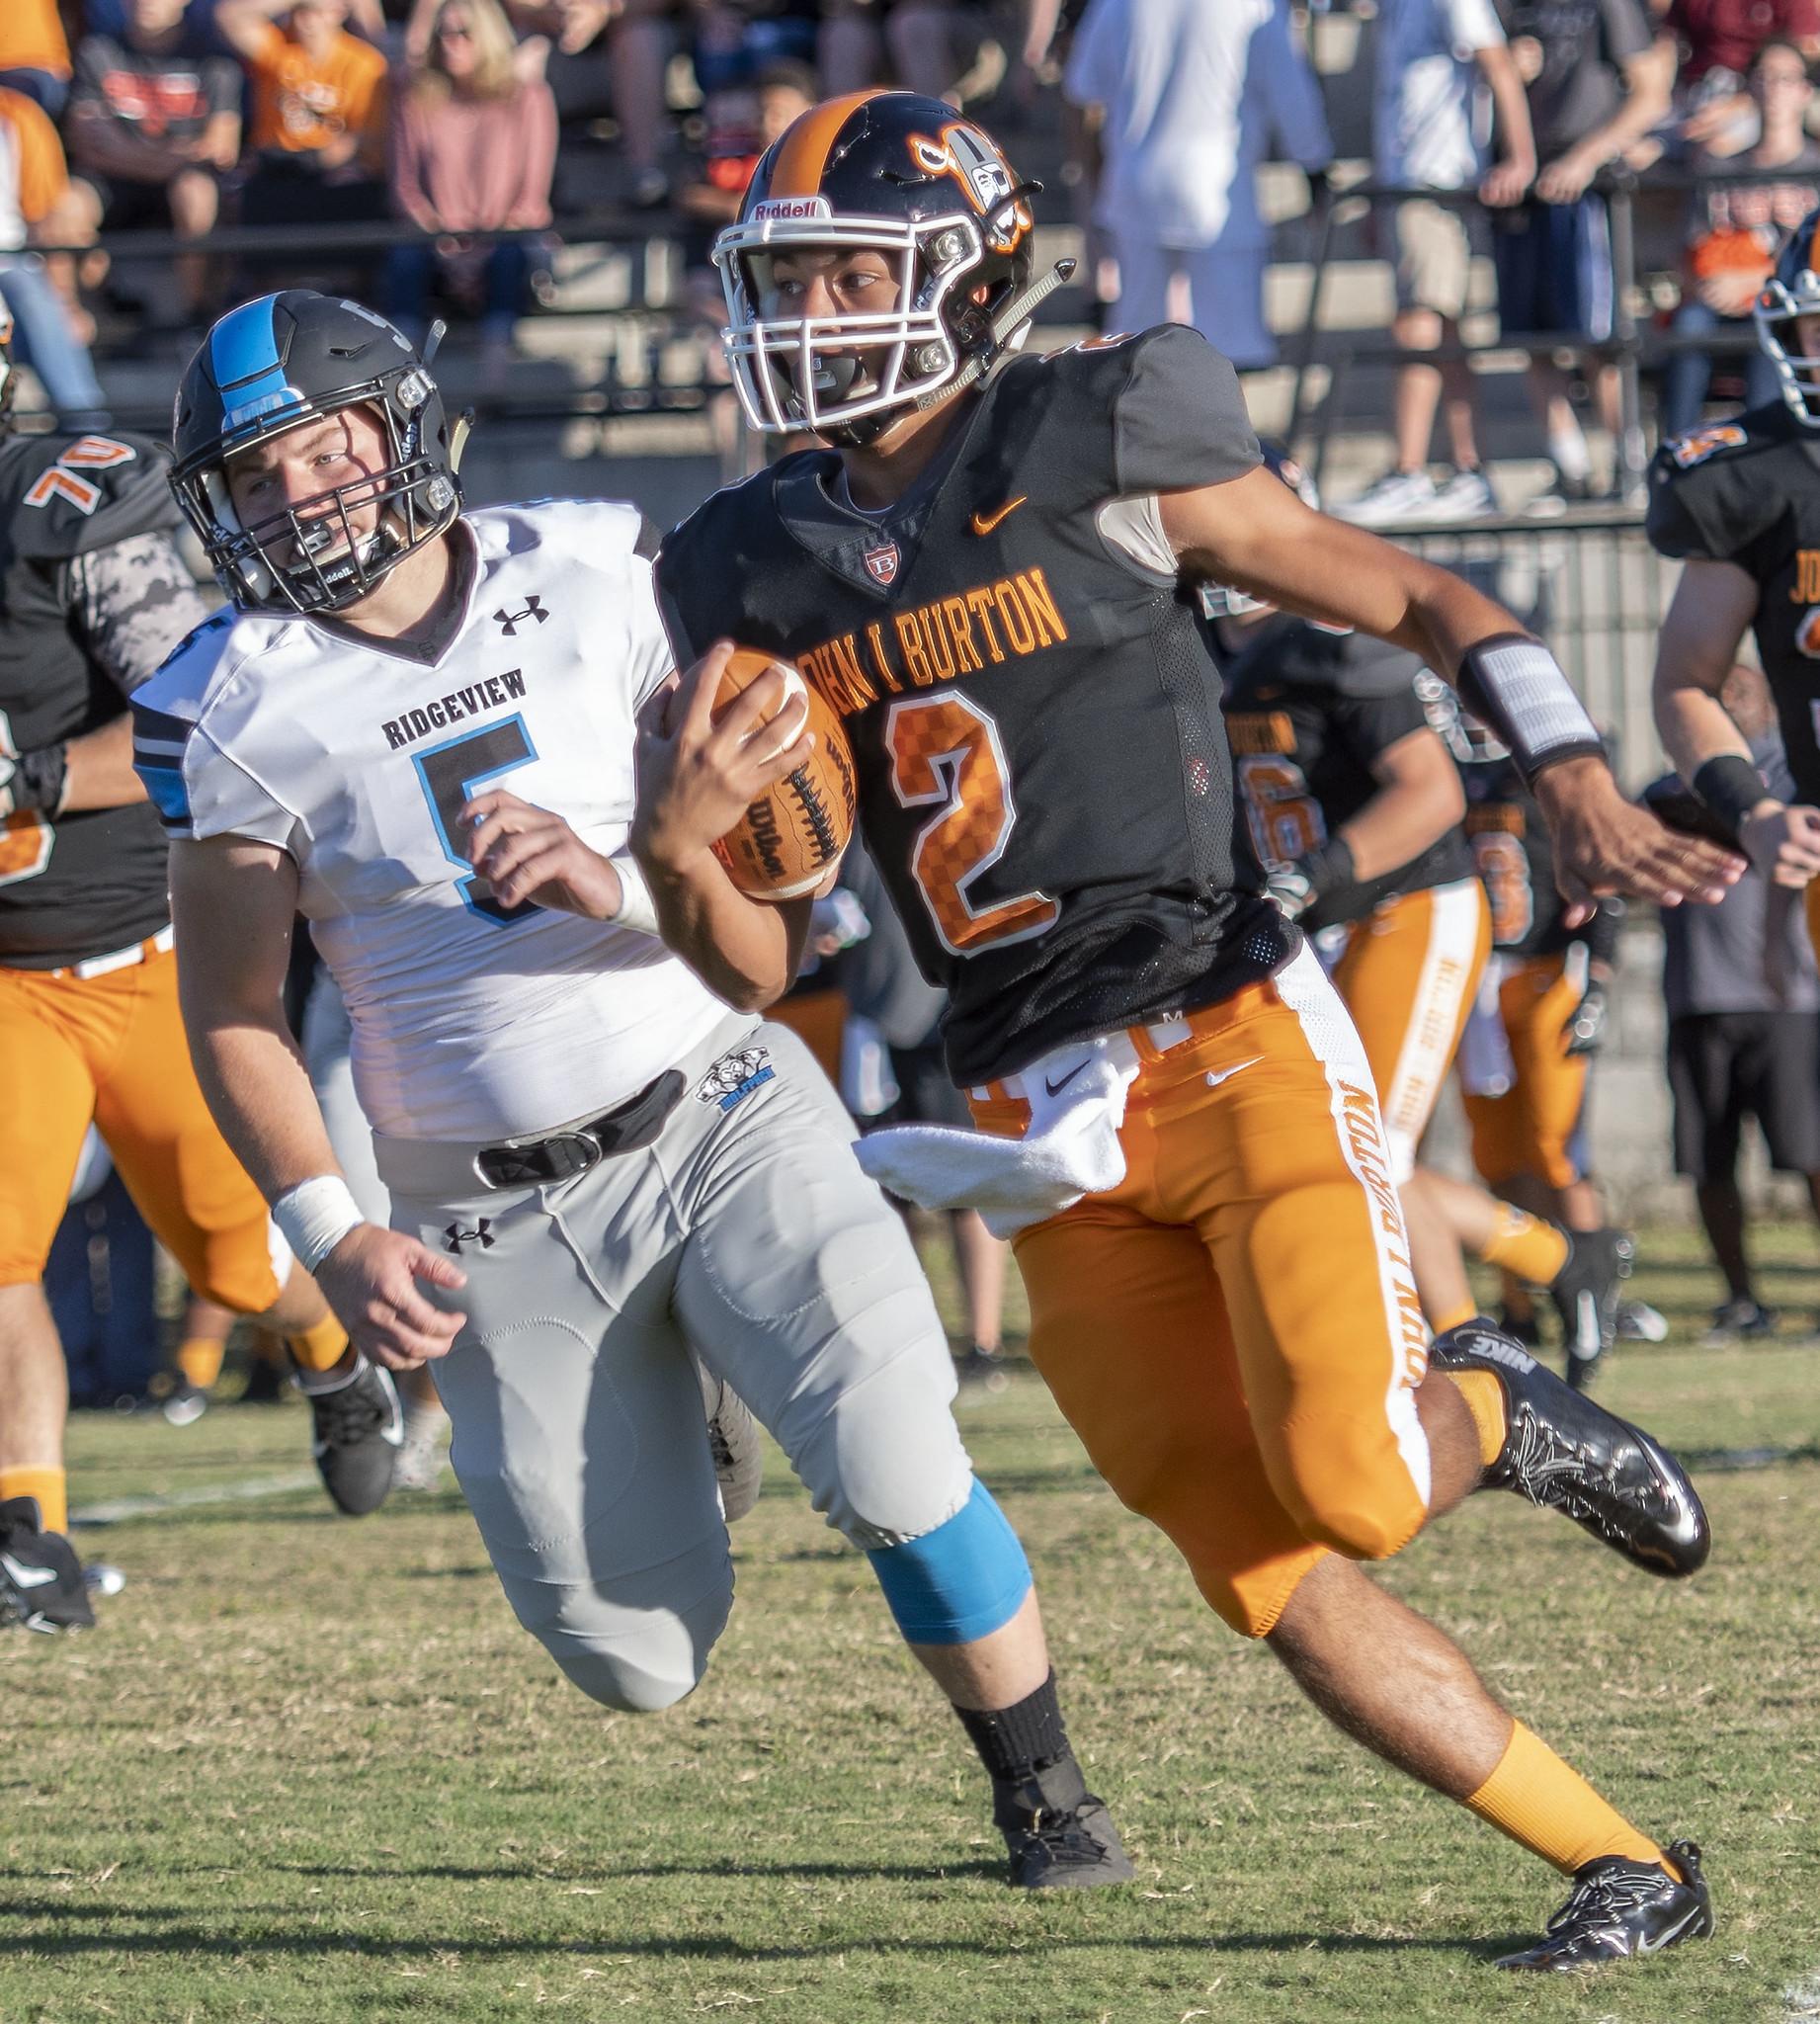 Ridgeview vs JI Burton Football